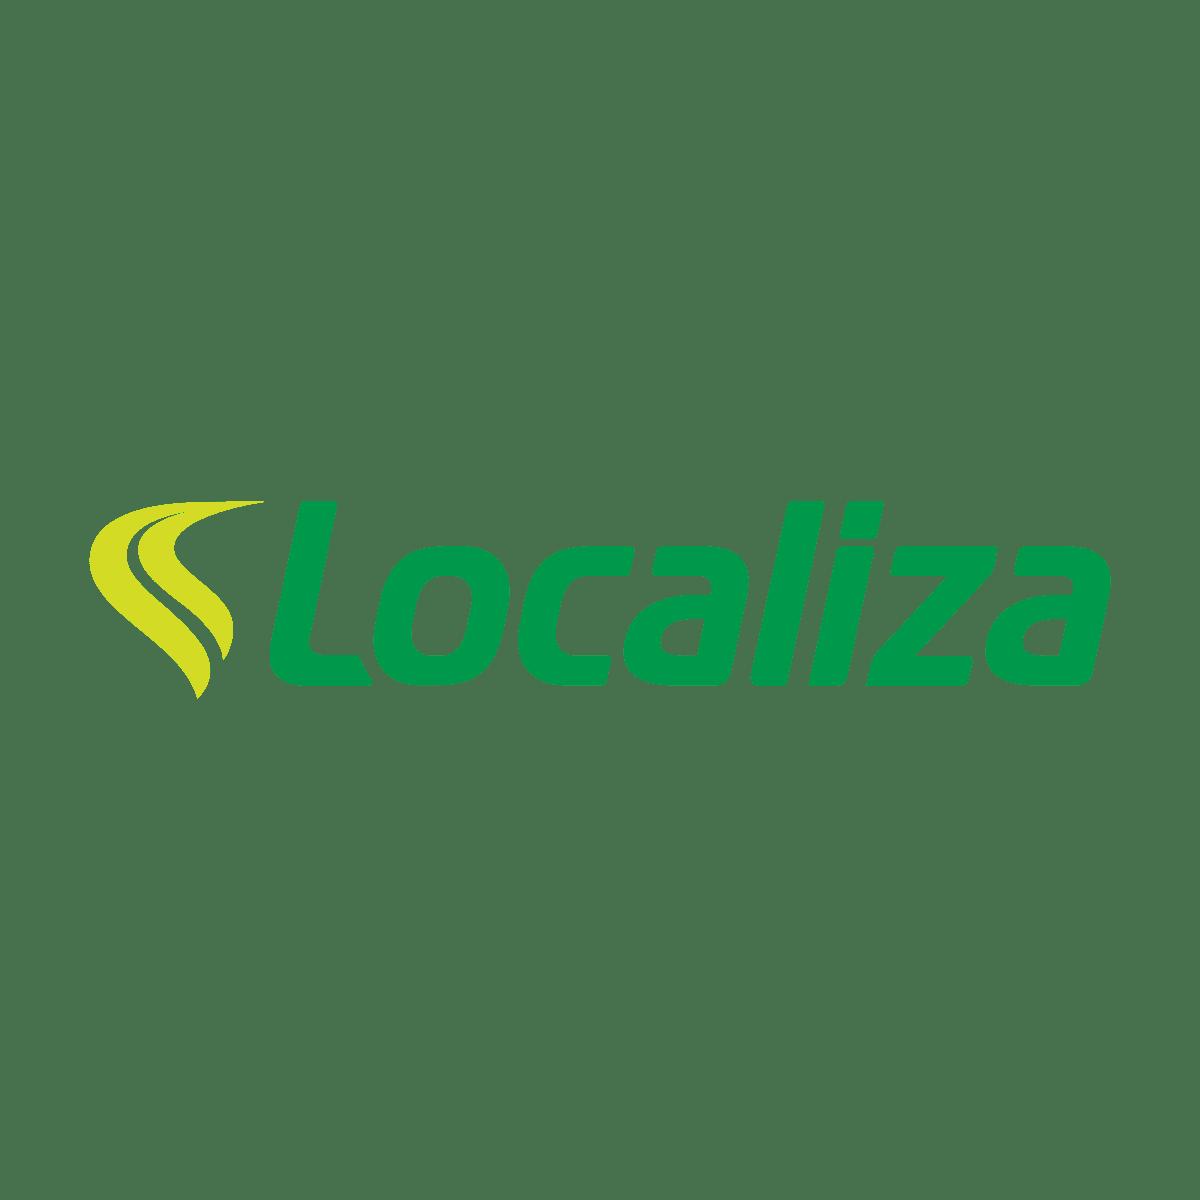 LOGO LOCALIZA POSITIVA